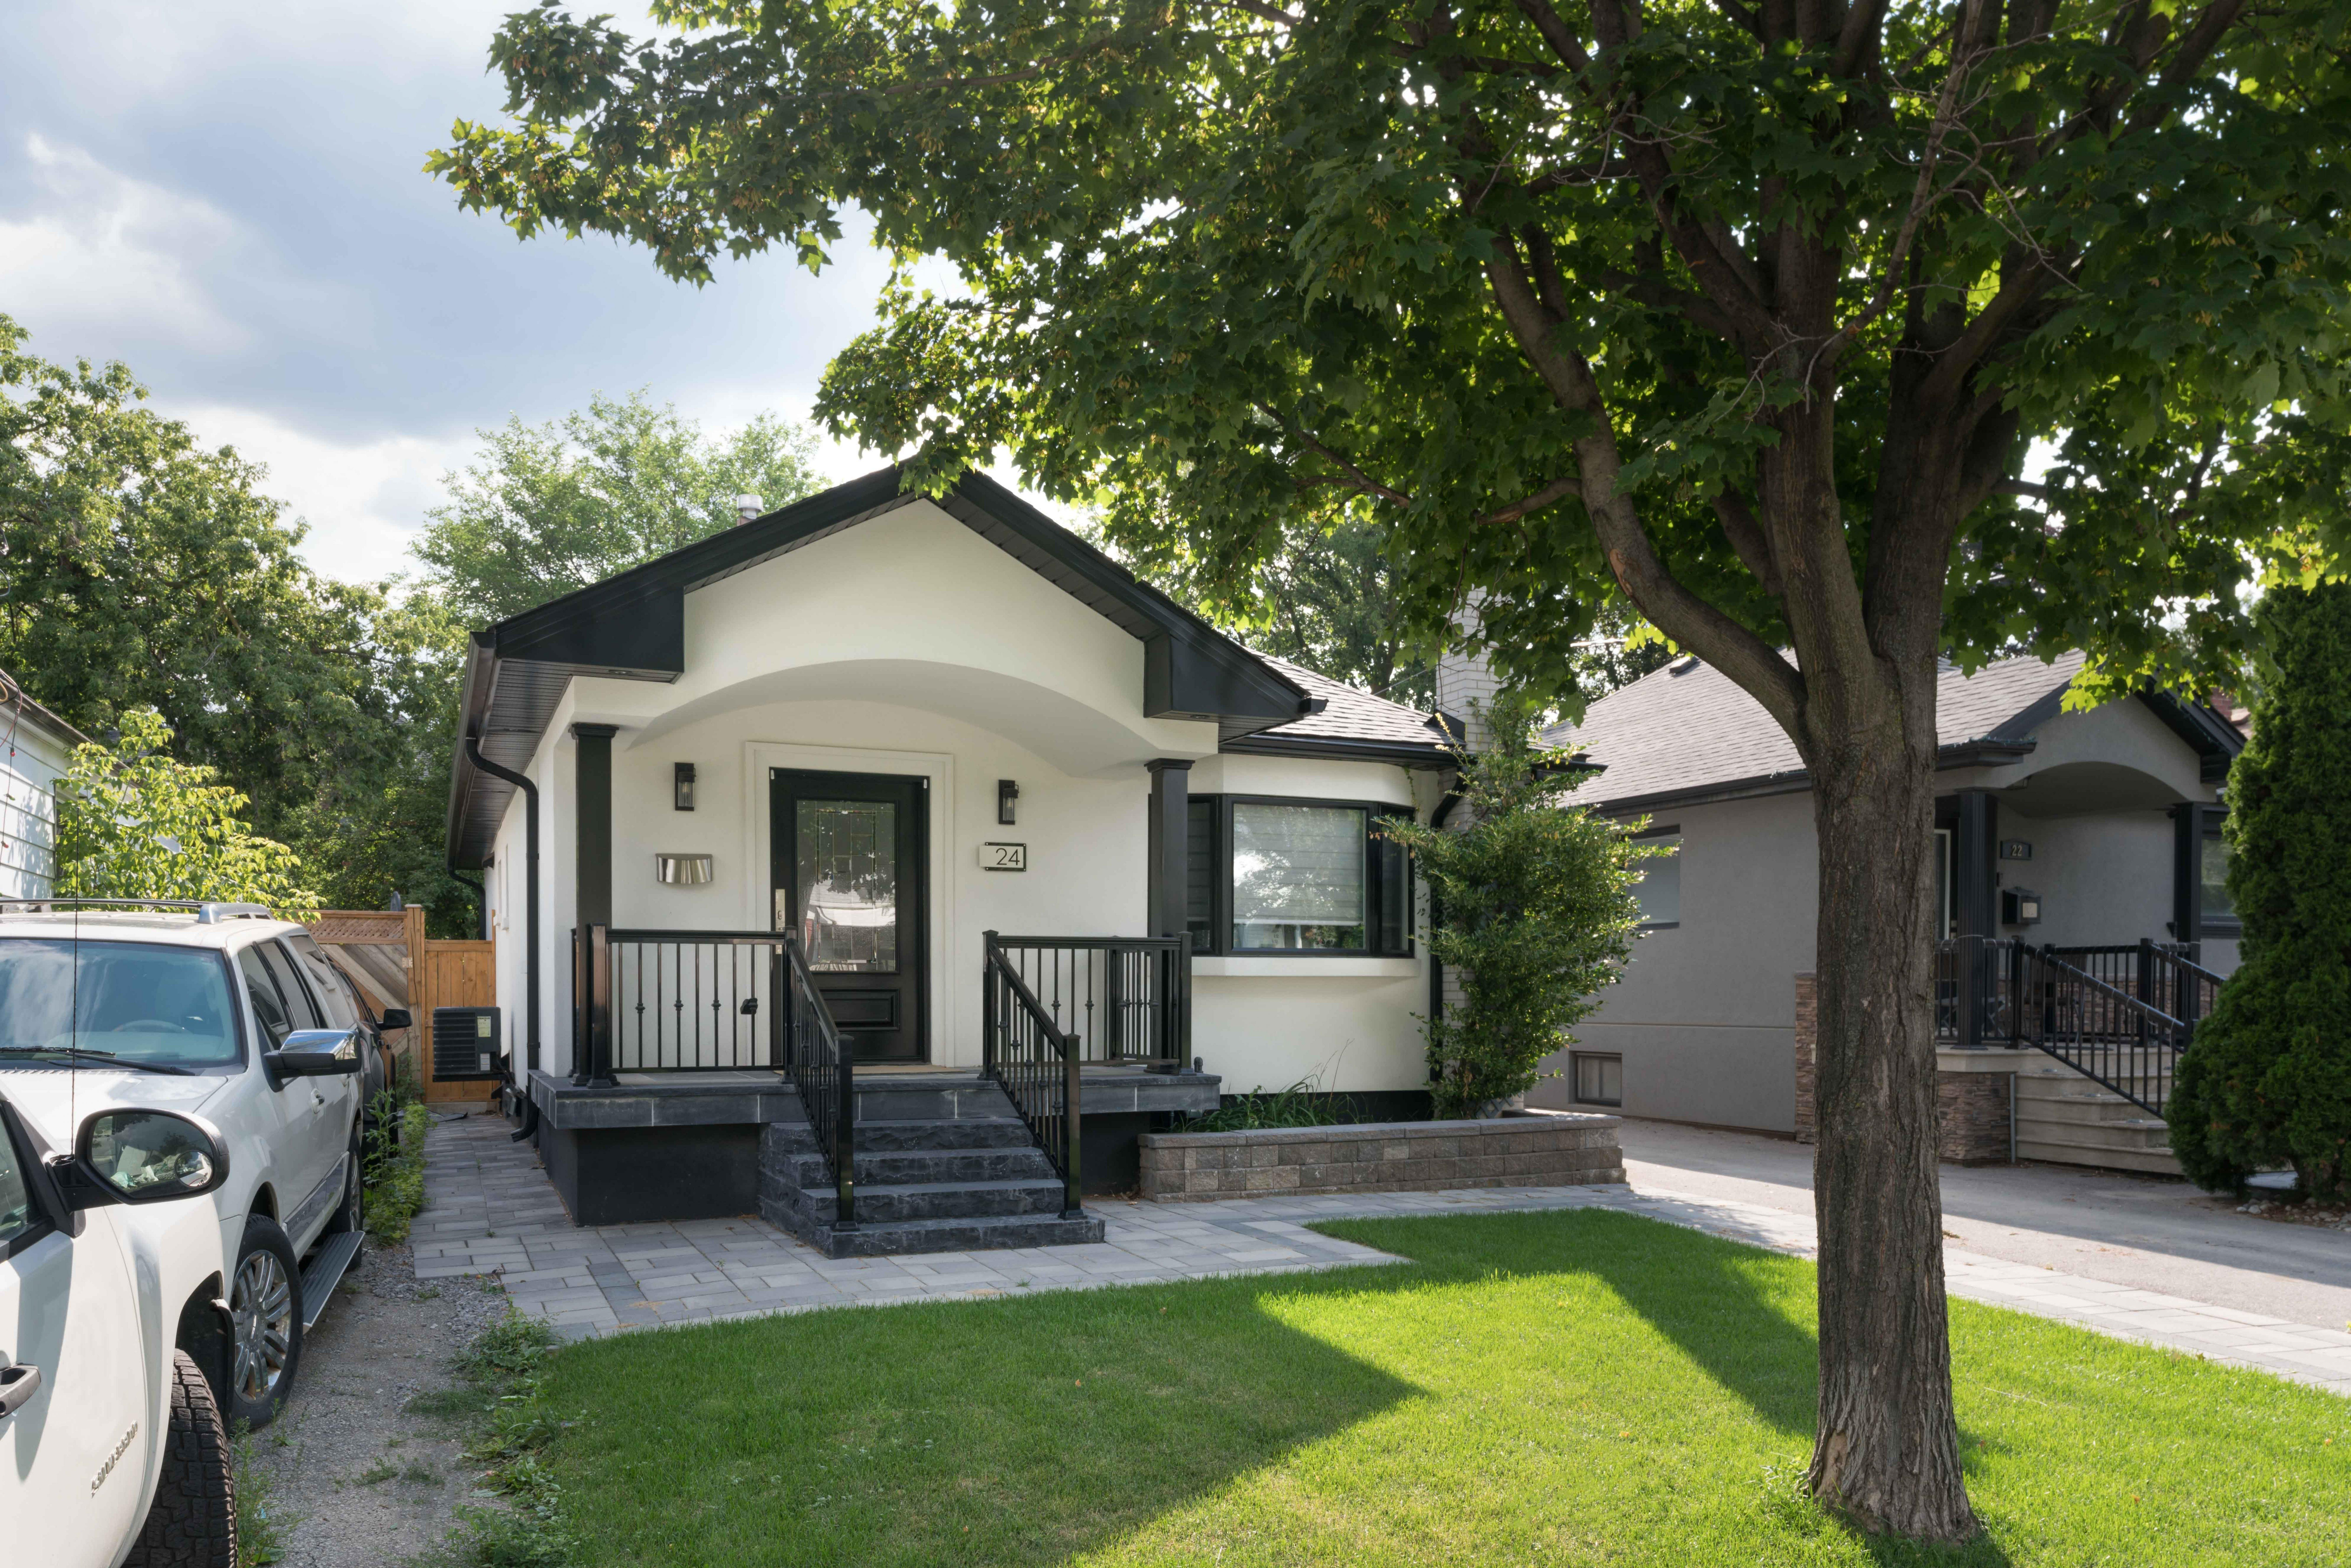 Front House Front house - Exterior stucco home near Acorn Ave, Etobicoke, TOronto, Ontario Sky Stucco Systems